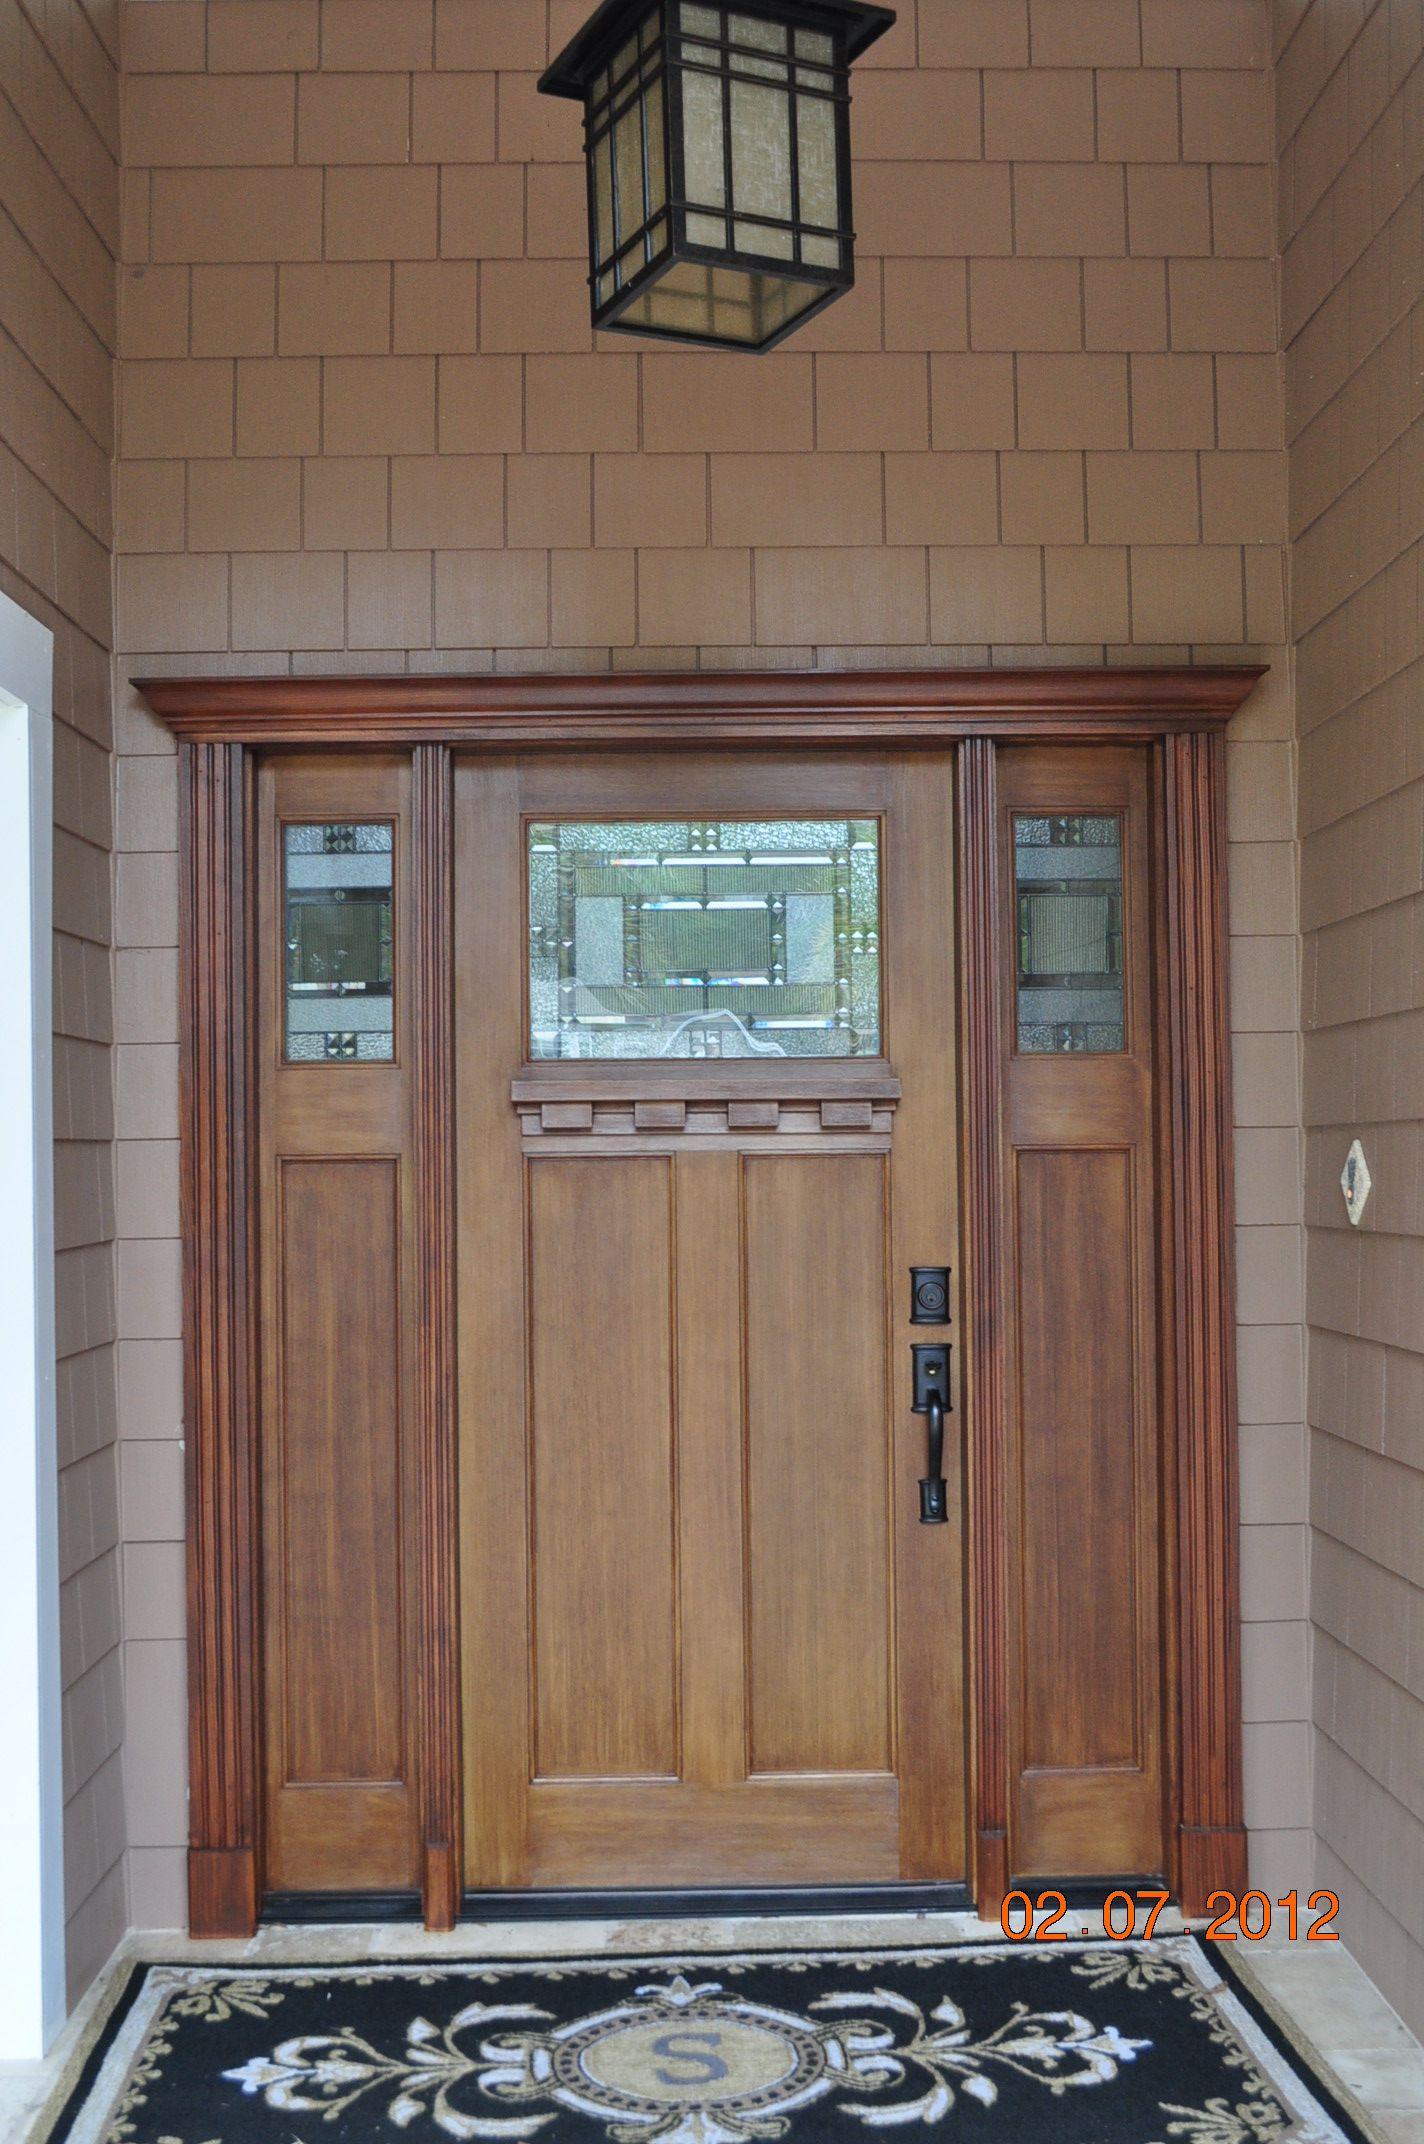 Entryway Plast Pro Fiberglass Door With Plast Pro Metropolis Glass And  Matching Side